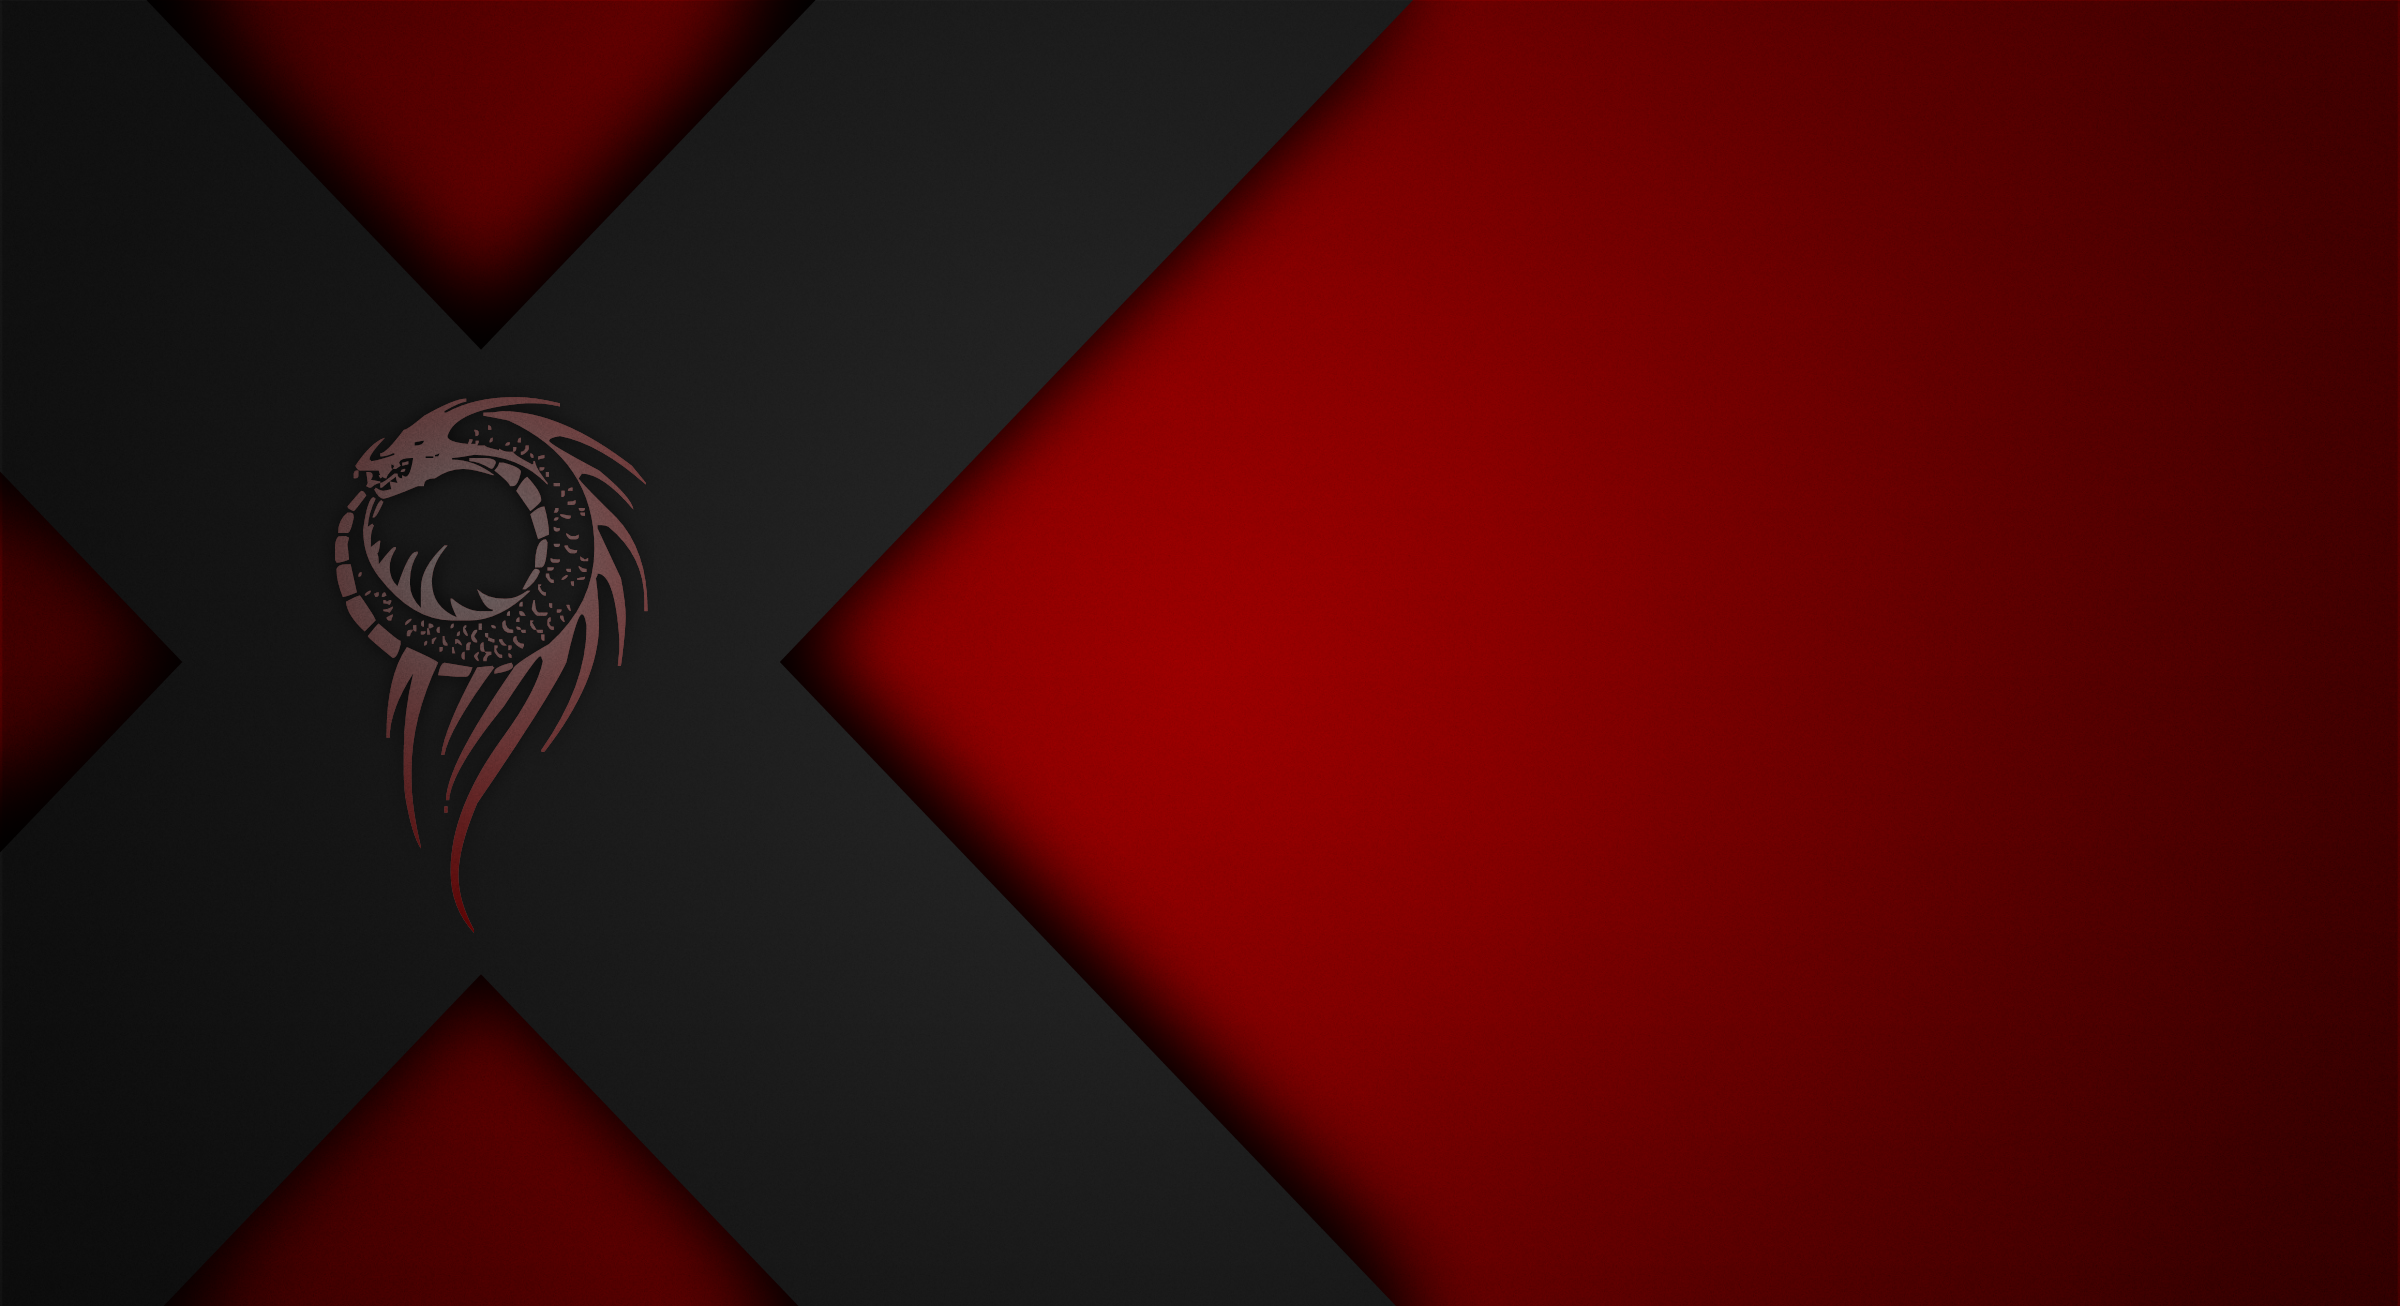 red dragon x wallpaper by labotaze on deviantart